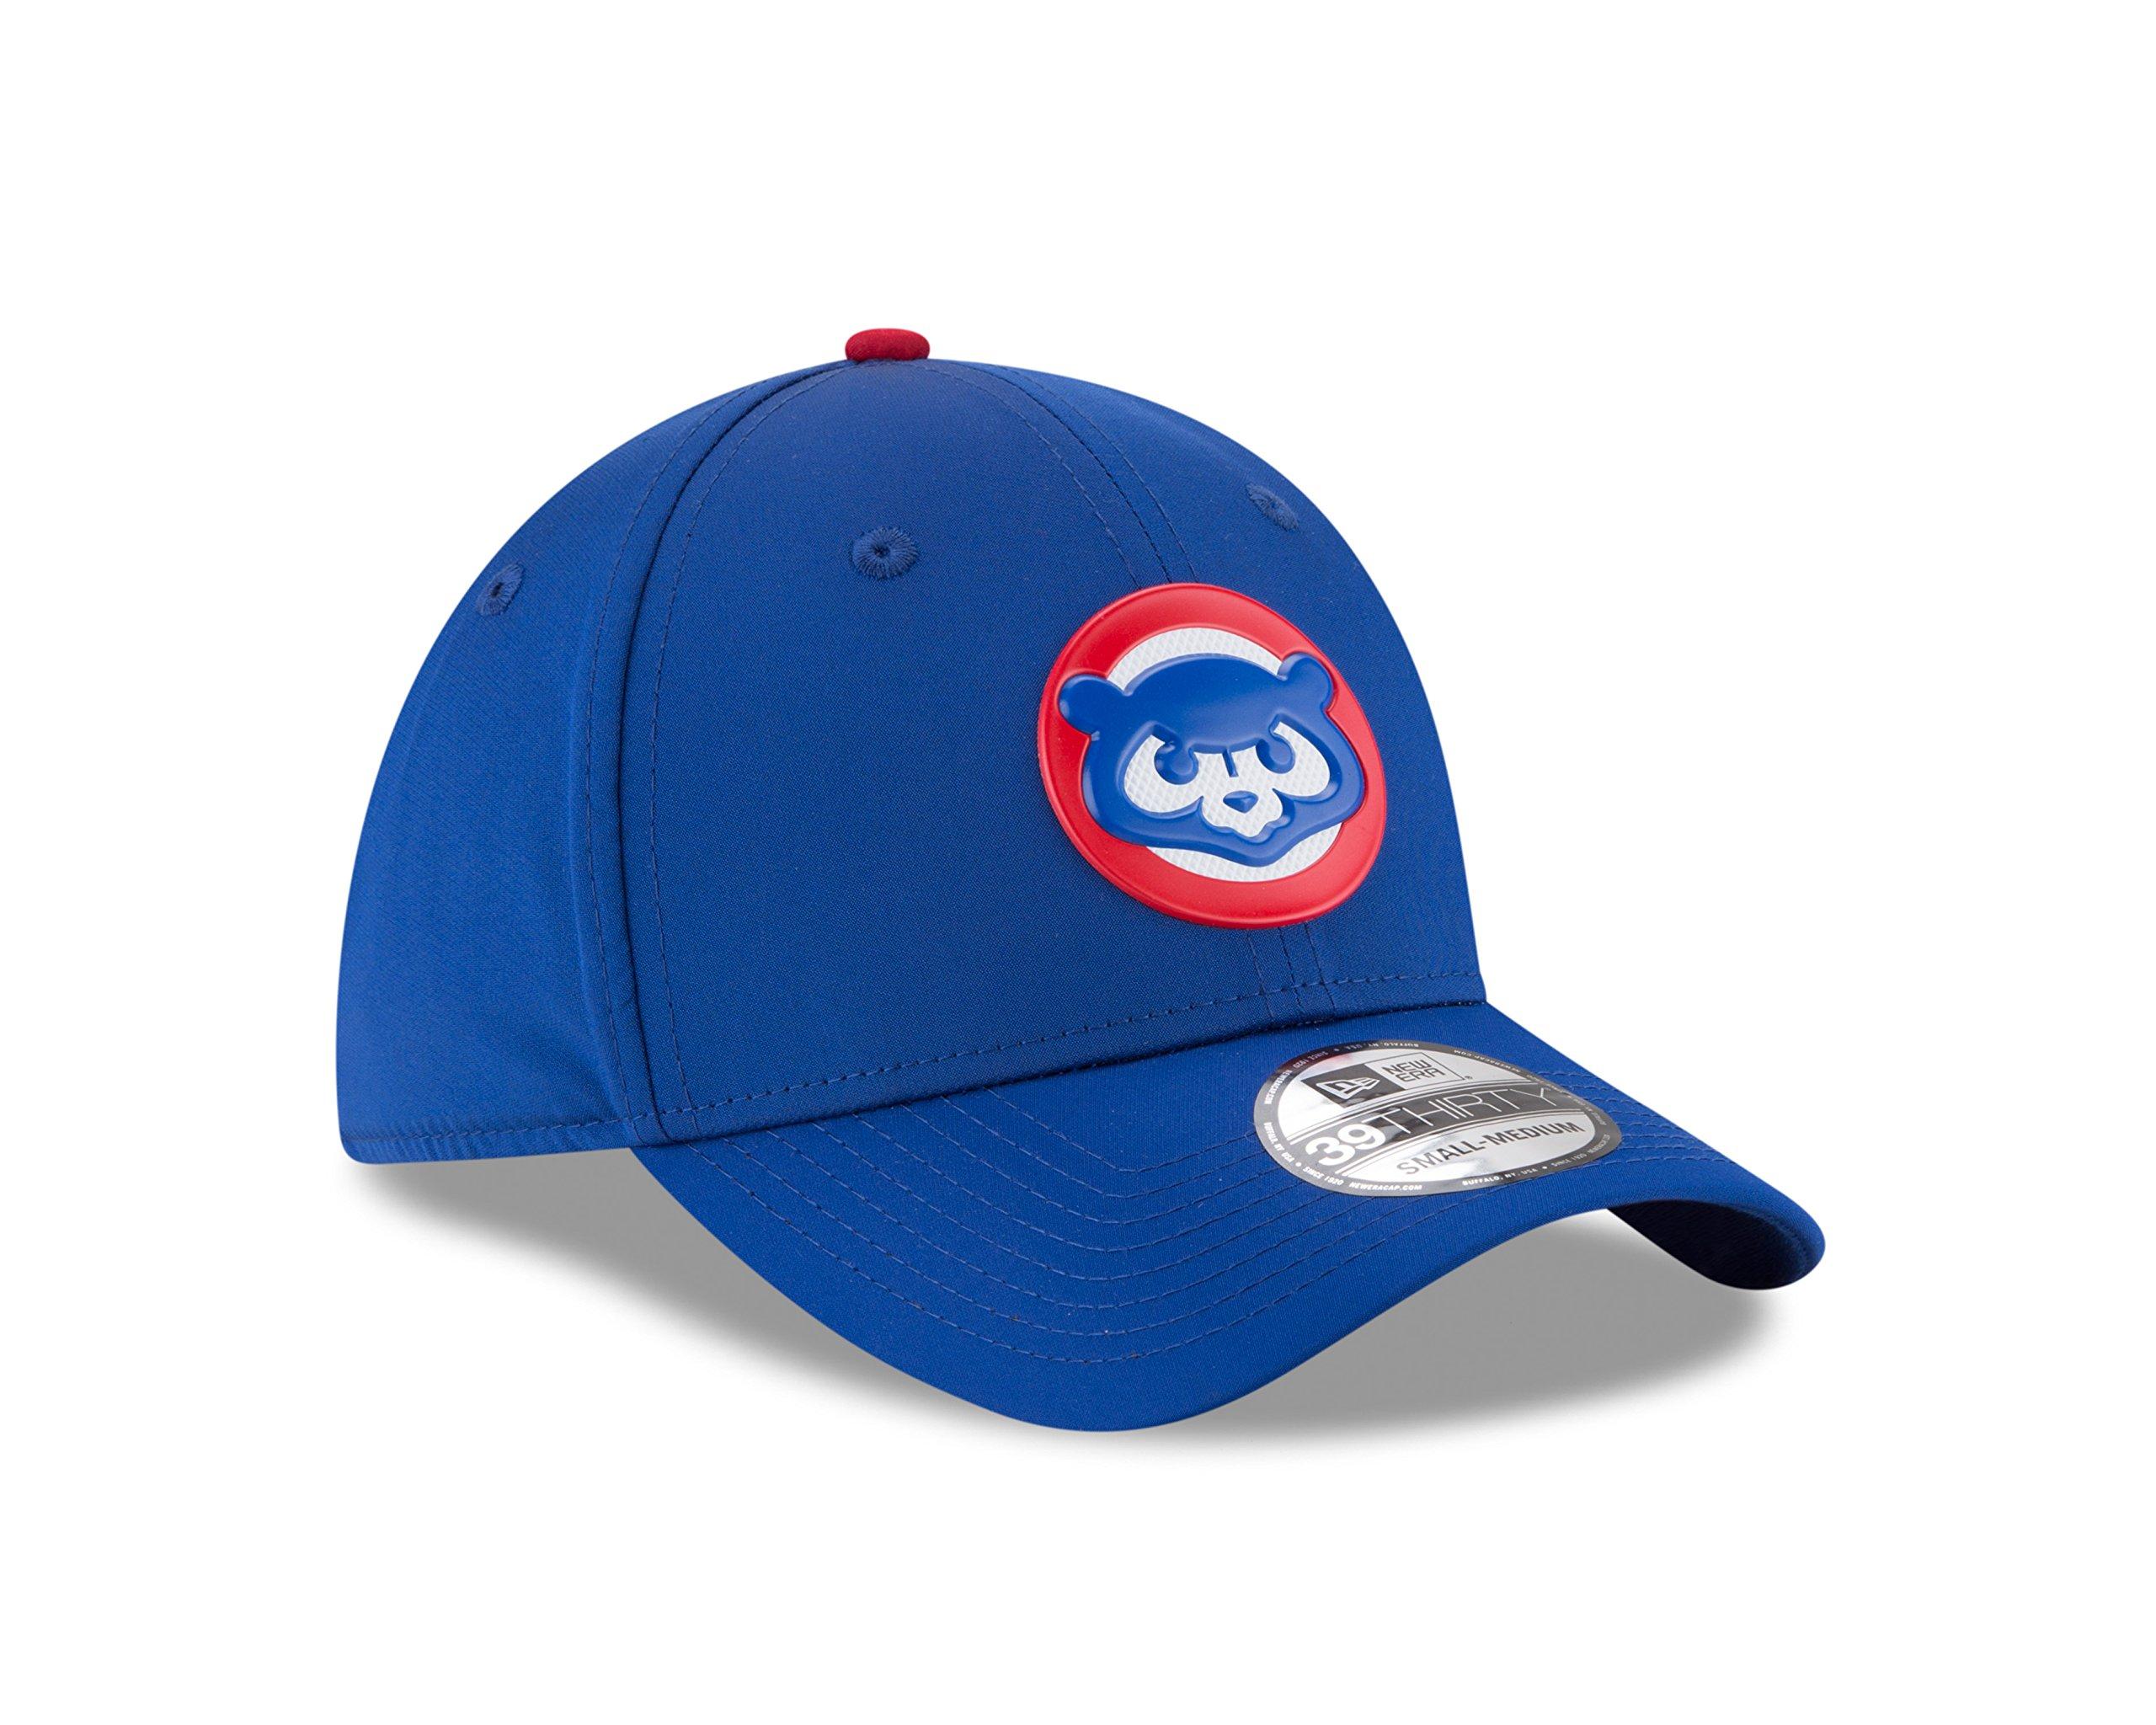 Chicago Cubs New Era 2018 On-Field Prolight Batting Practice 39THIRTY Flex Hat – ''Bear'' Logo (M/L)